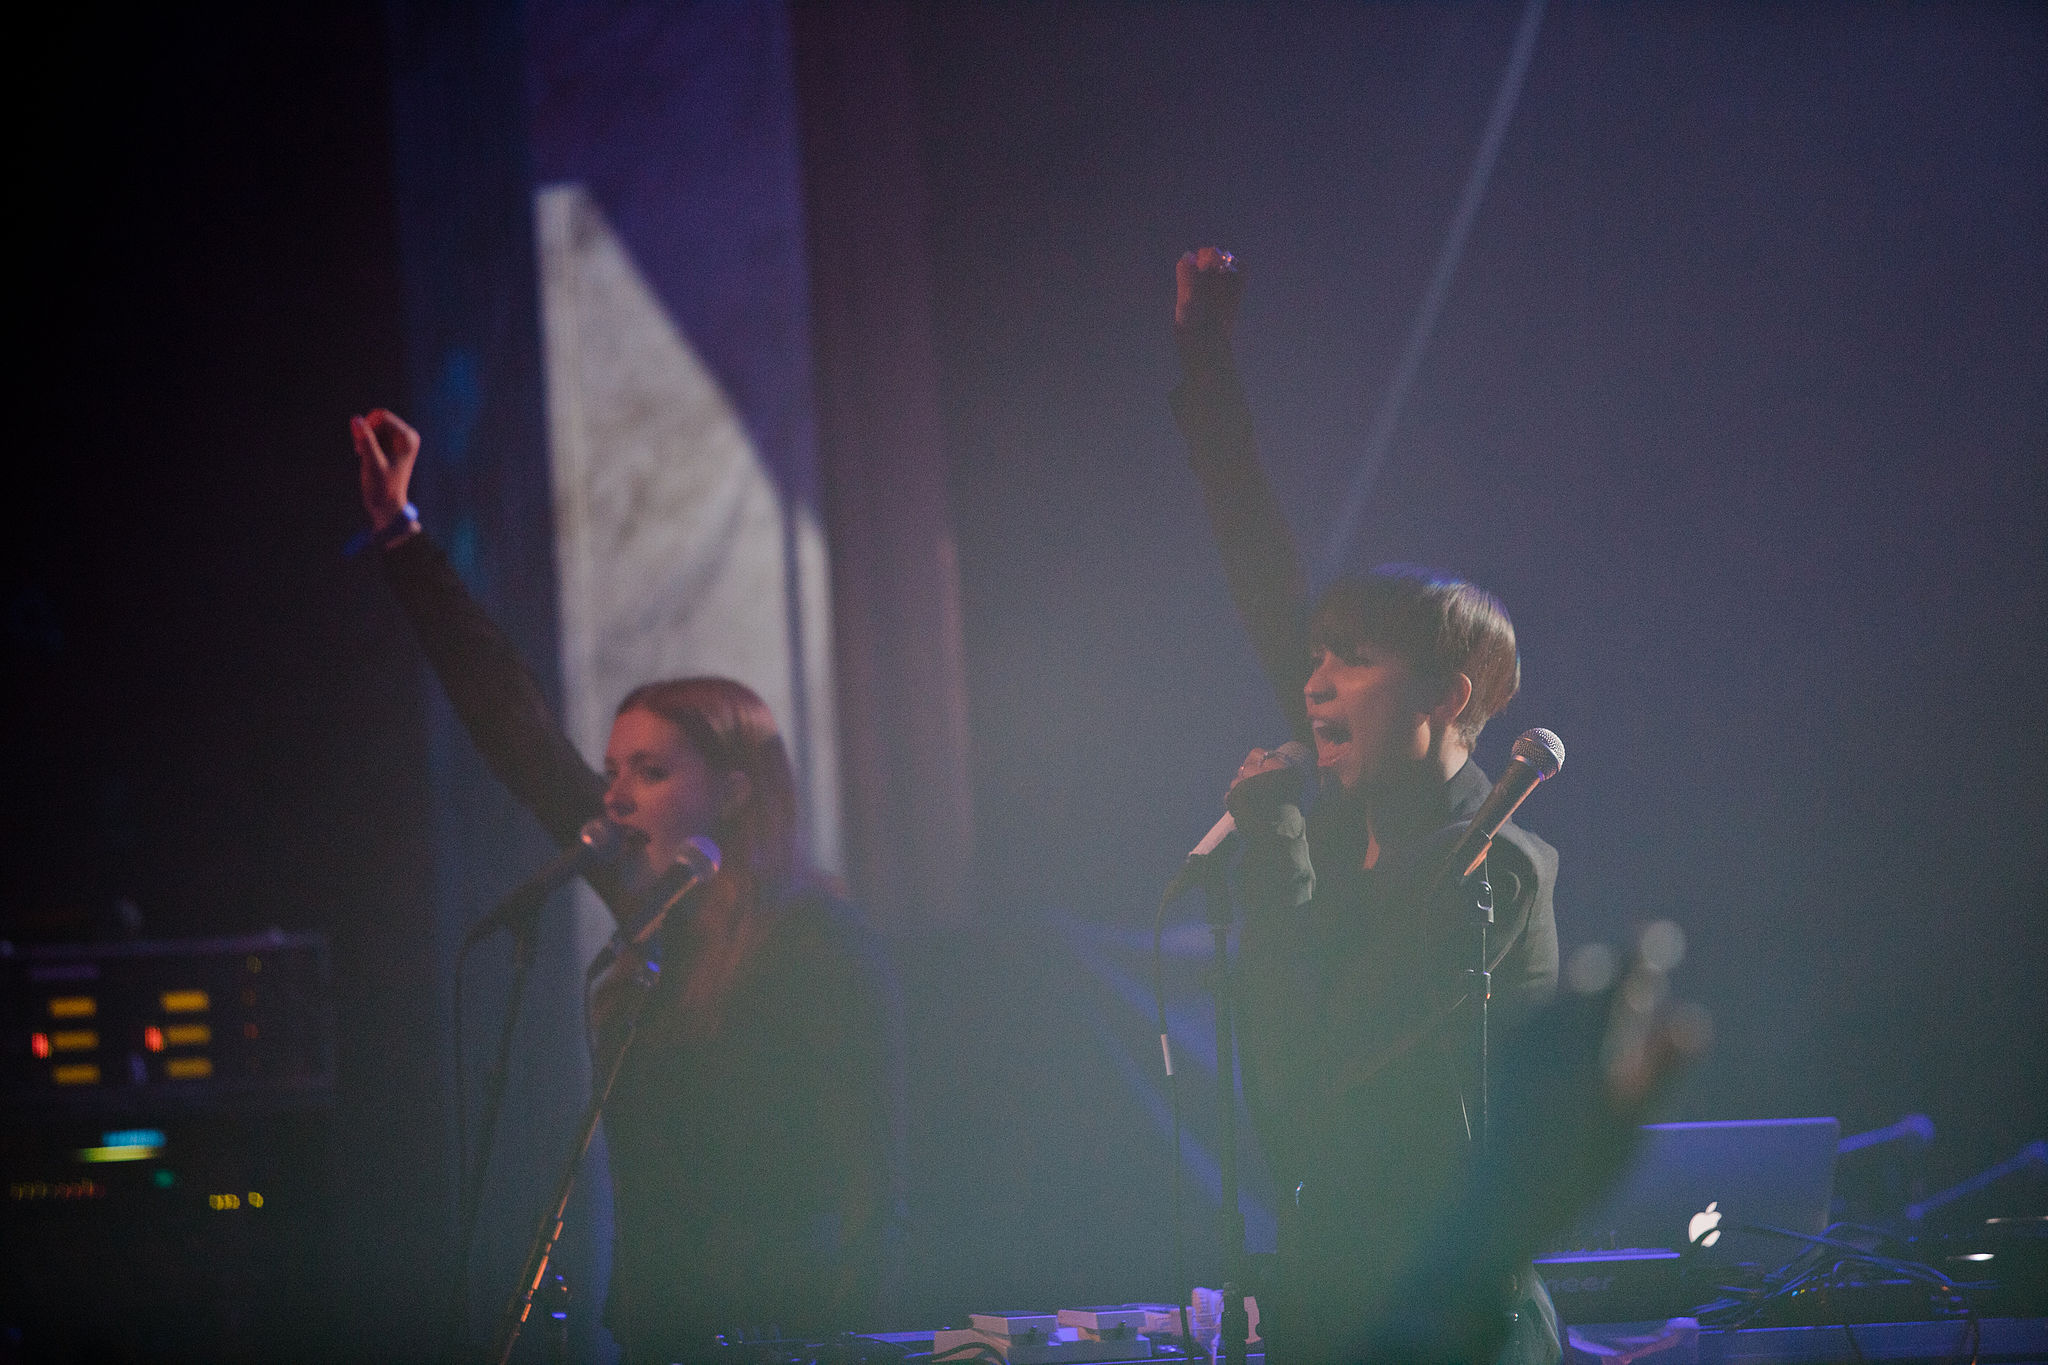 Icona Pop - iTunes Festival - Roundhouse - London - Konzert - Auftritt - Gratis - Kostenlos - Free - Hack4Life